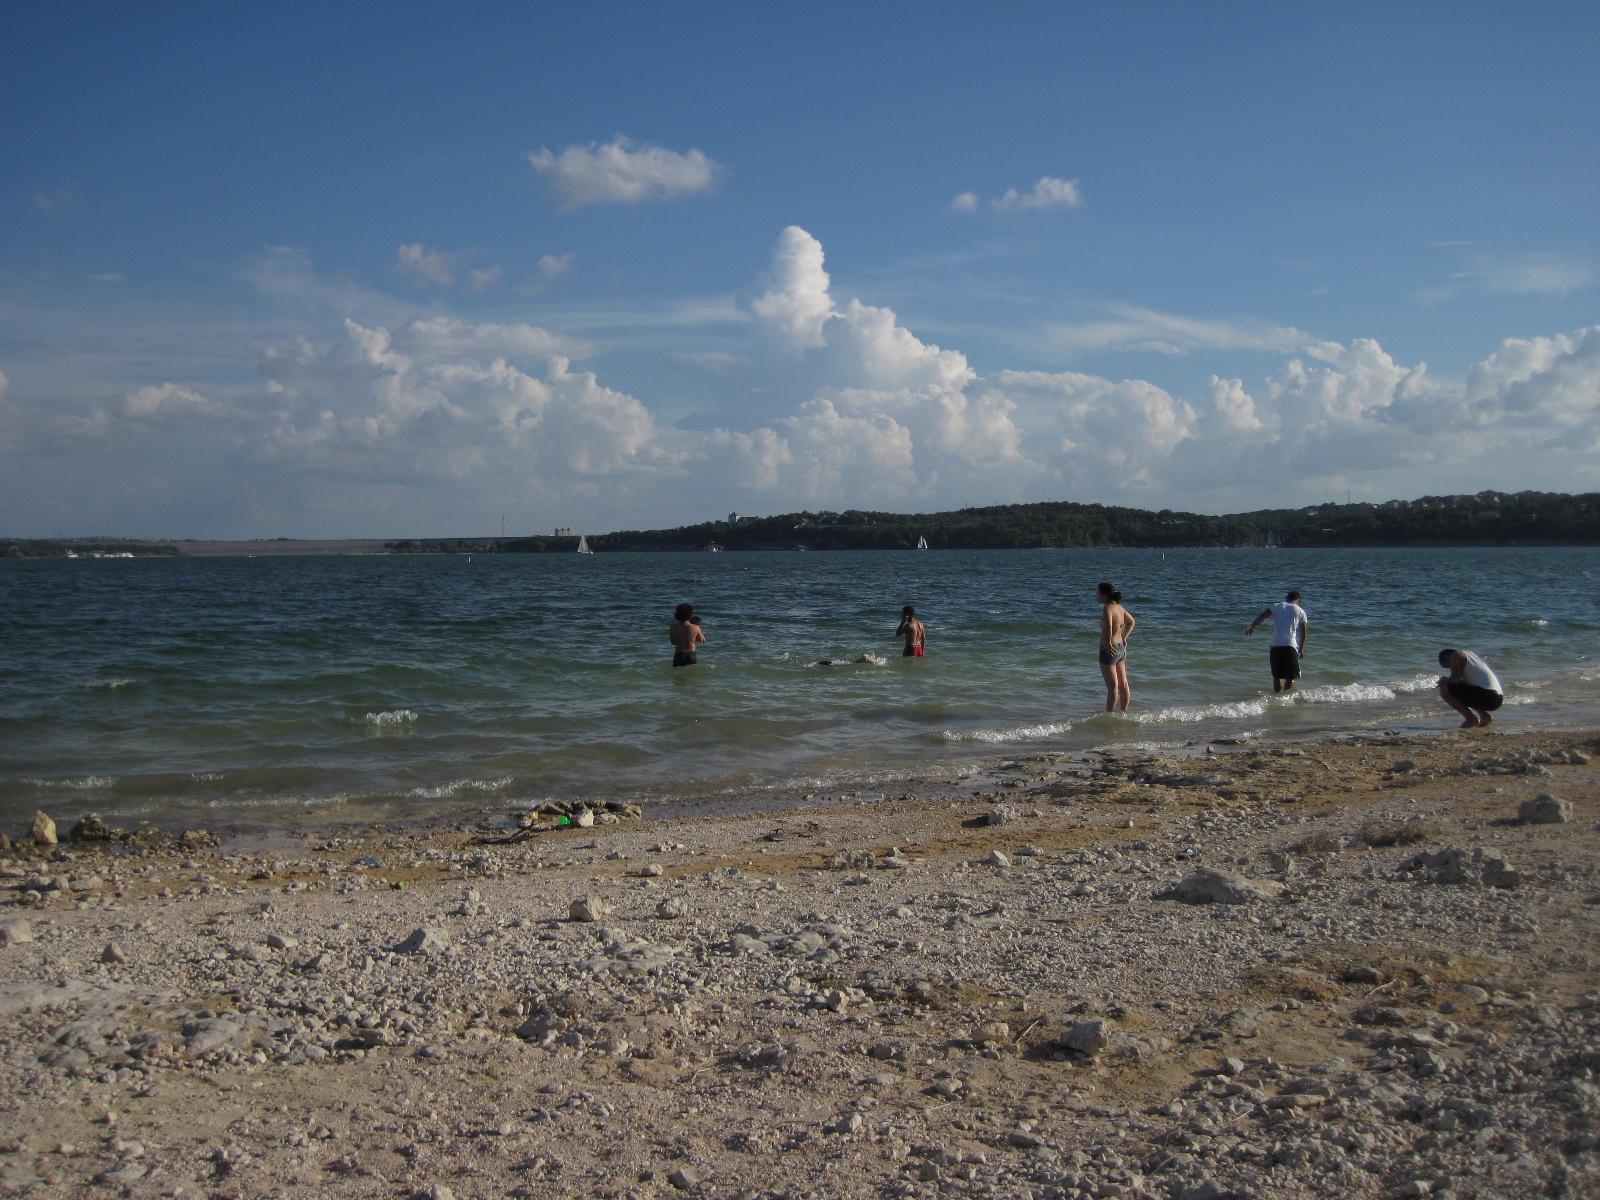 File:Lake Travis Beach, Texas..JPG - Wikimedia Commons